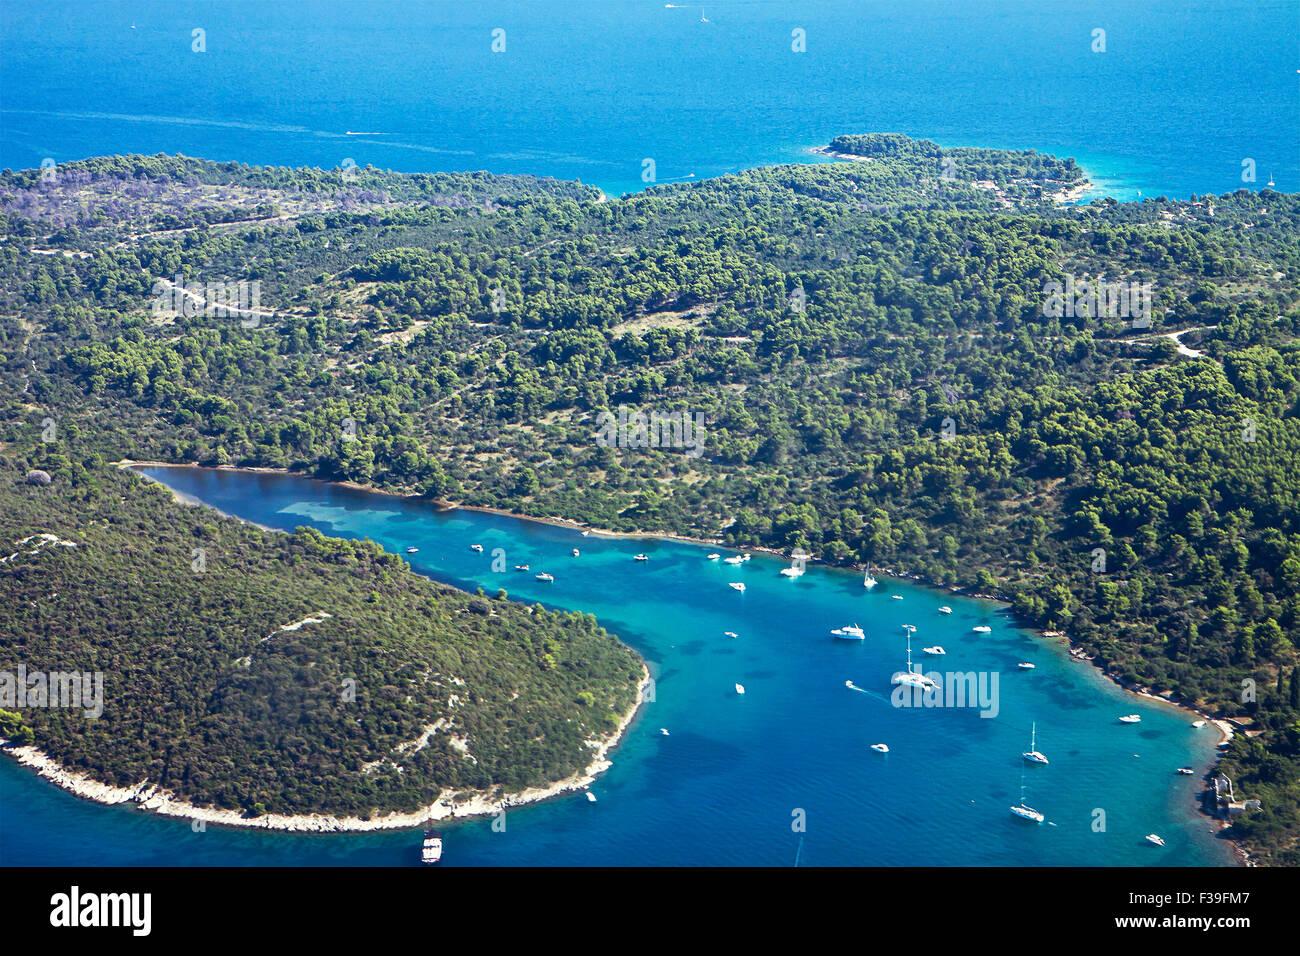 beautiful aerial view of the Dalmatian coast of Croatia near Split airport - Stock Image